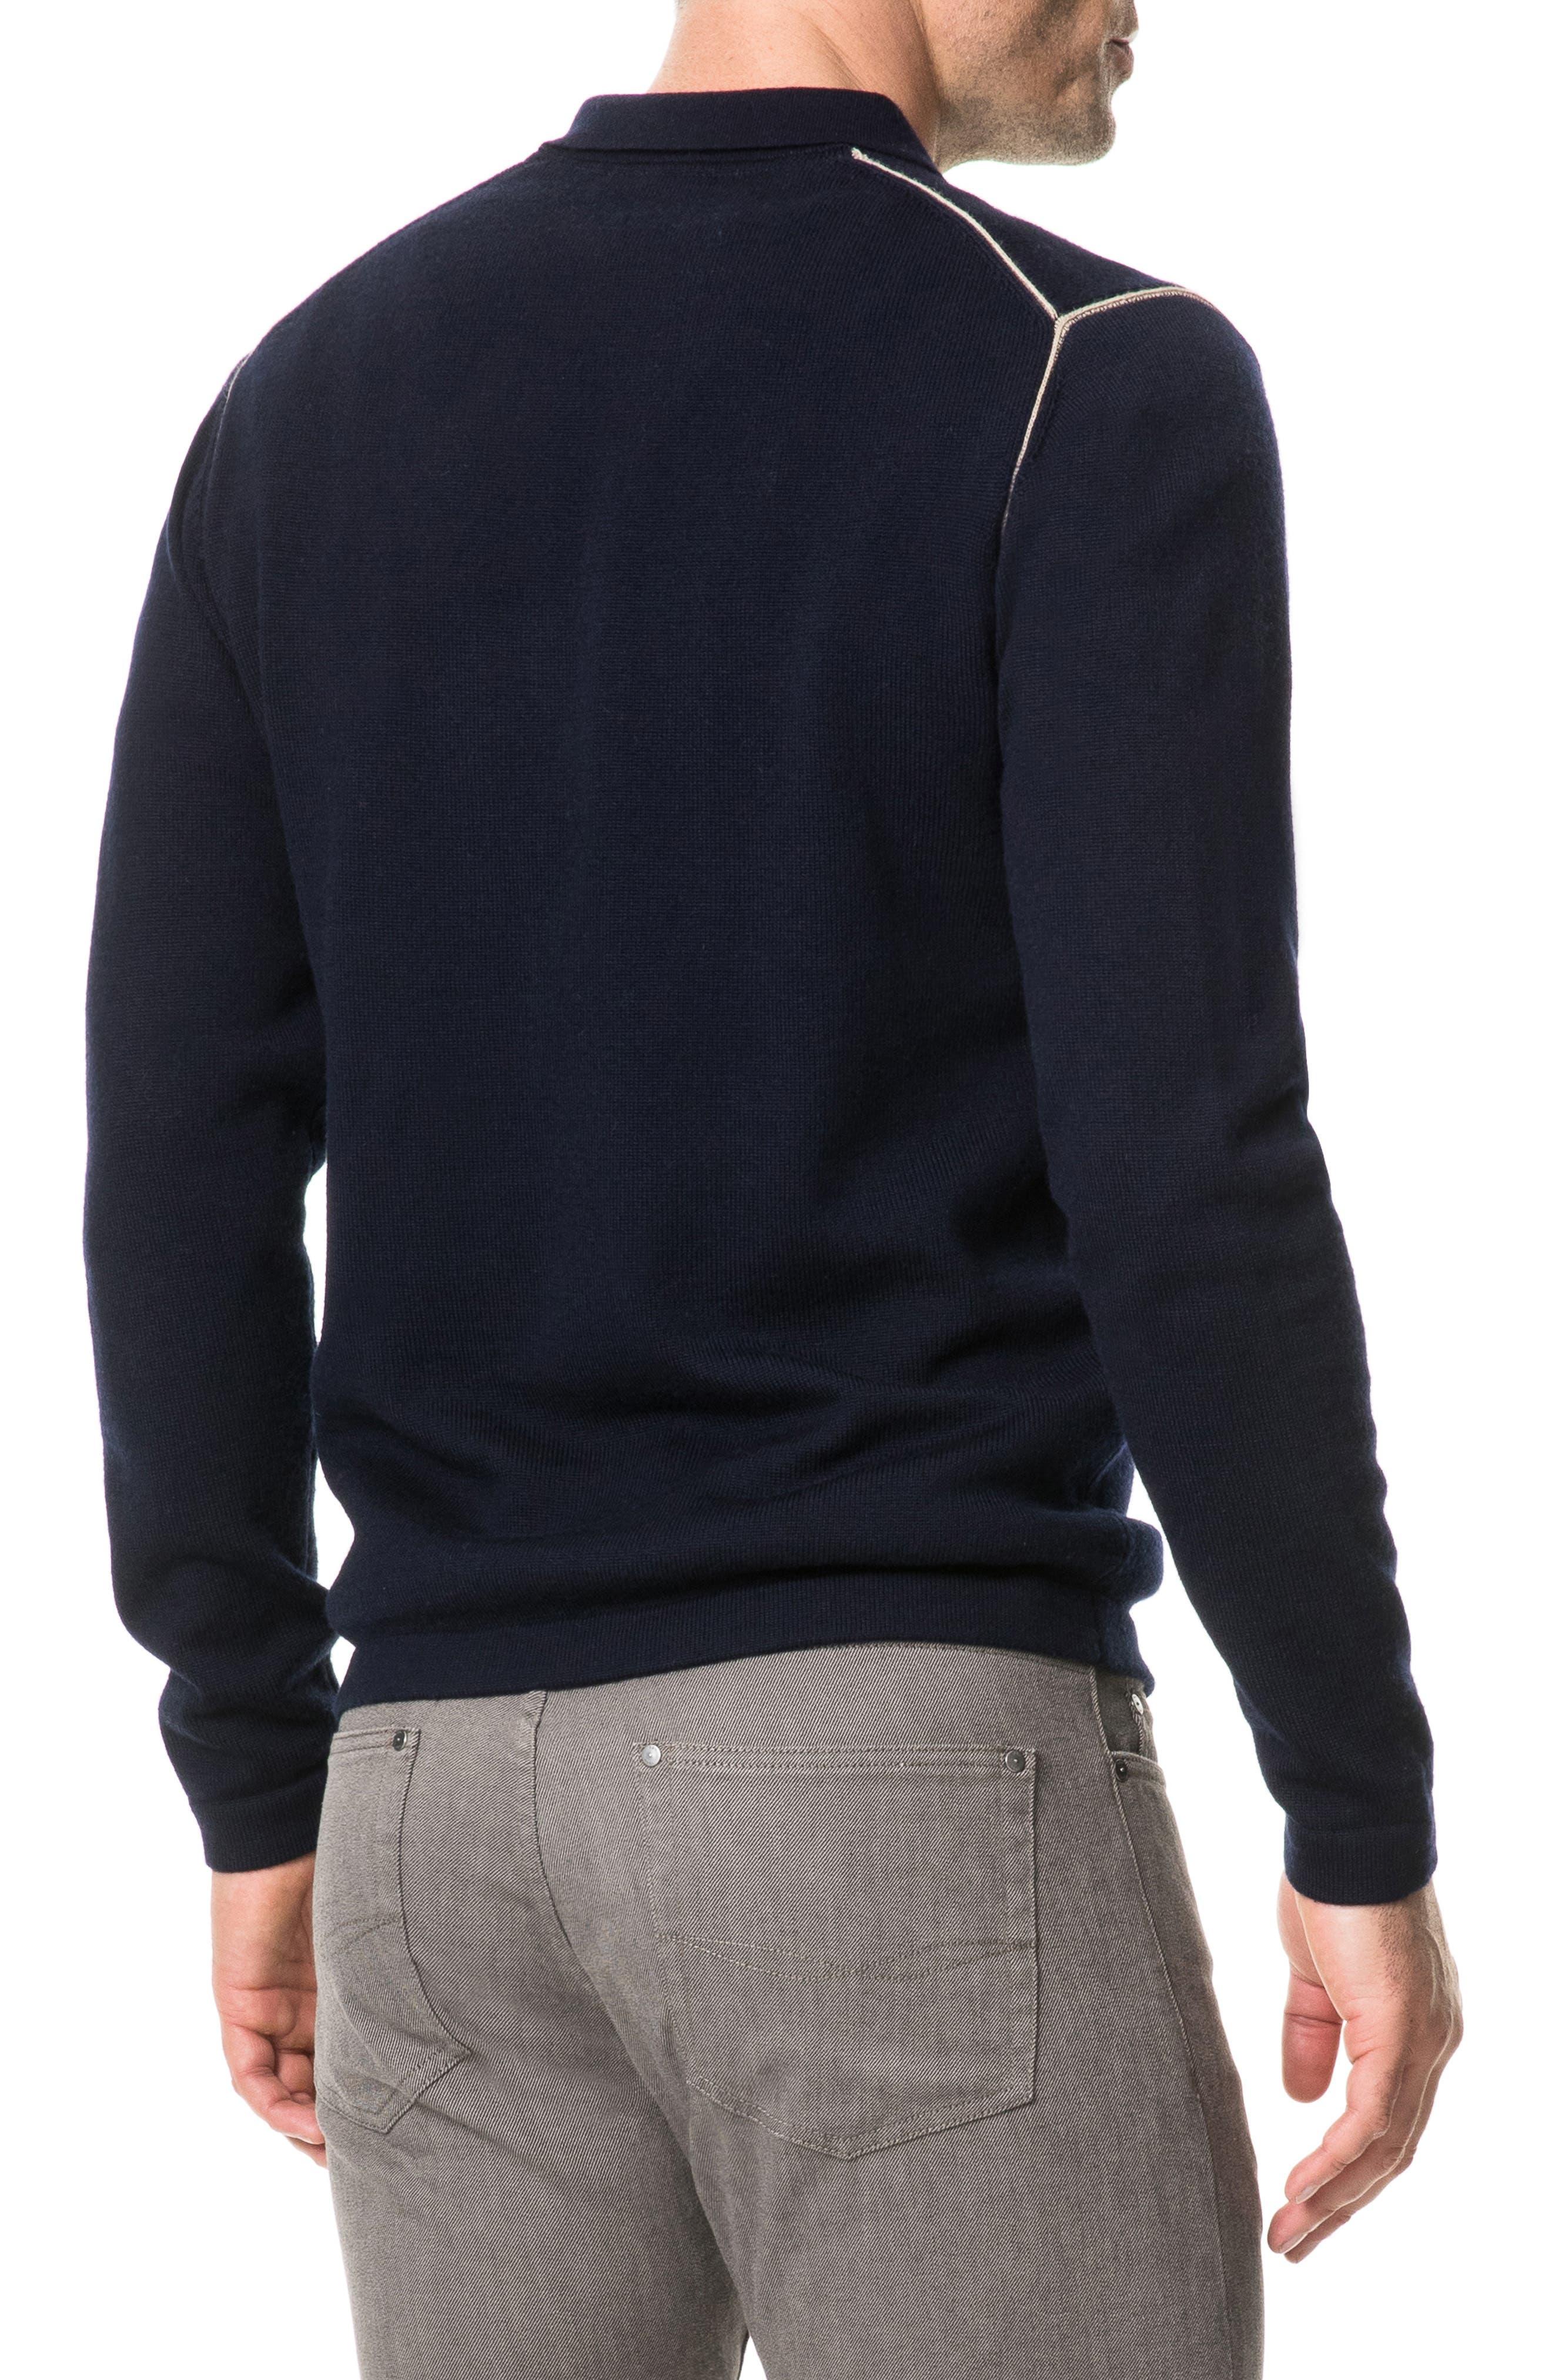 Revill Reserve Merino Wool Zip Polo,                             Alternate thumbnail 2, color,                             MARINE